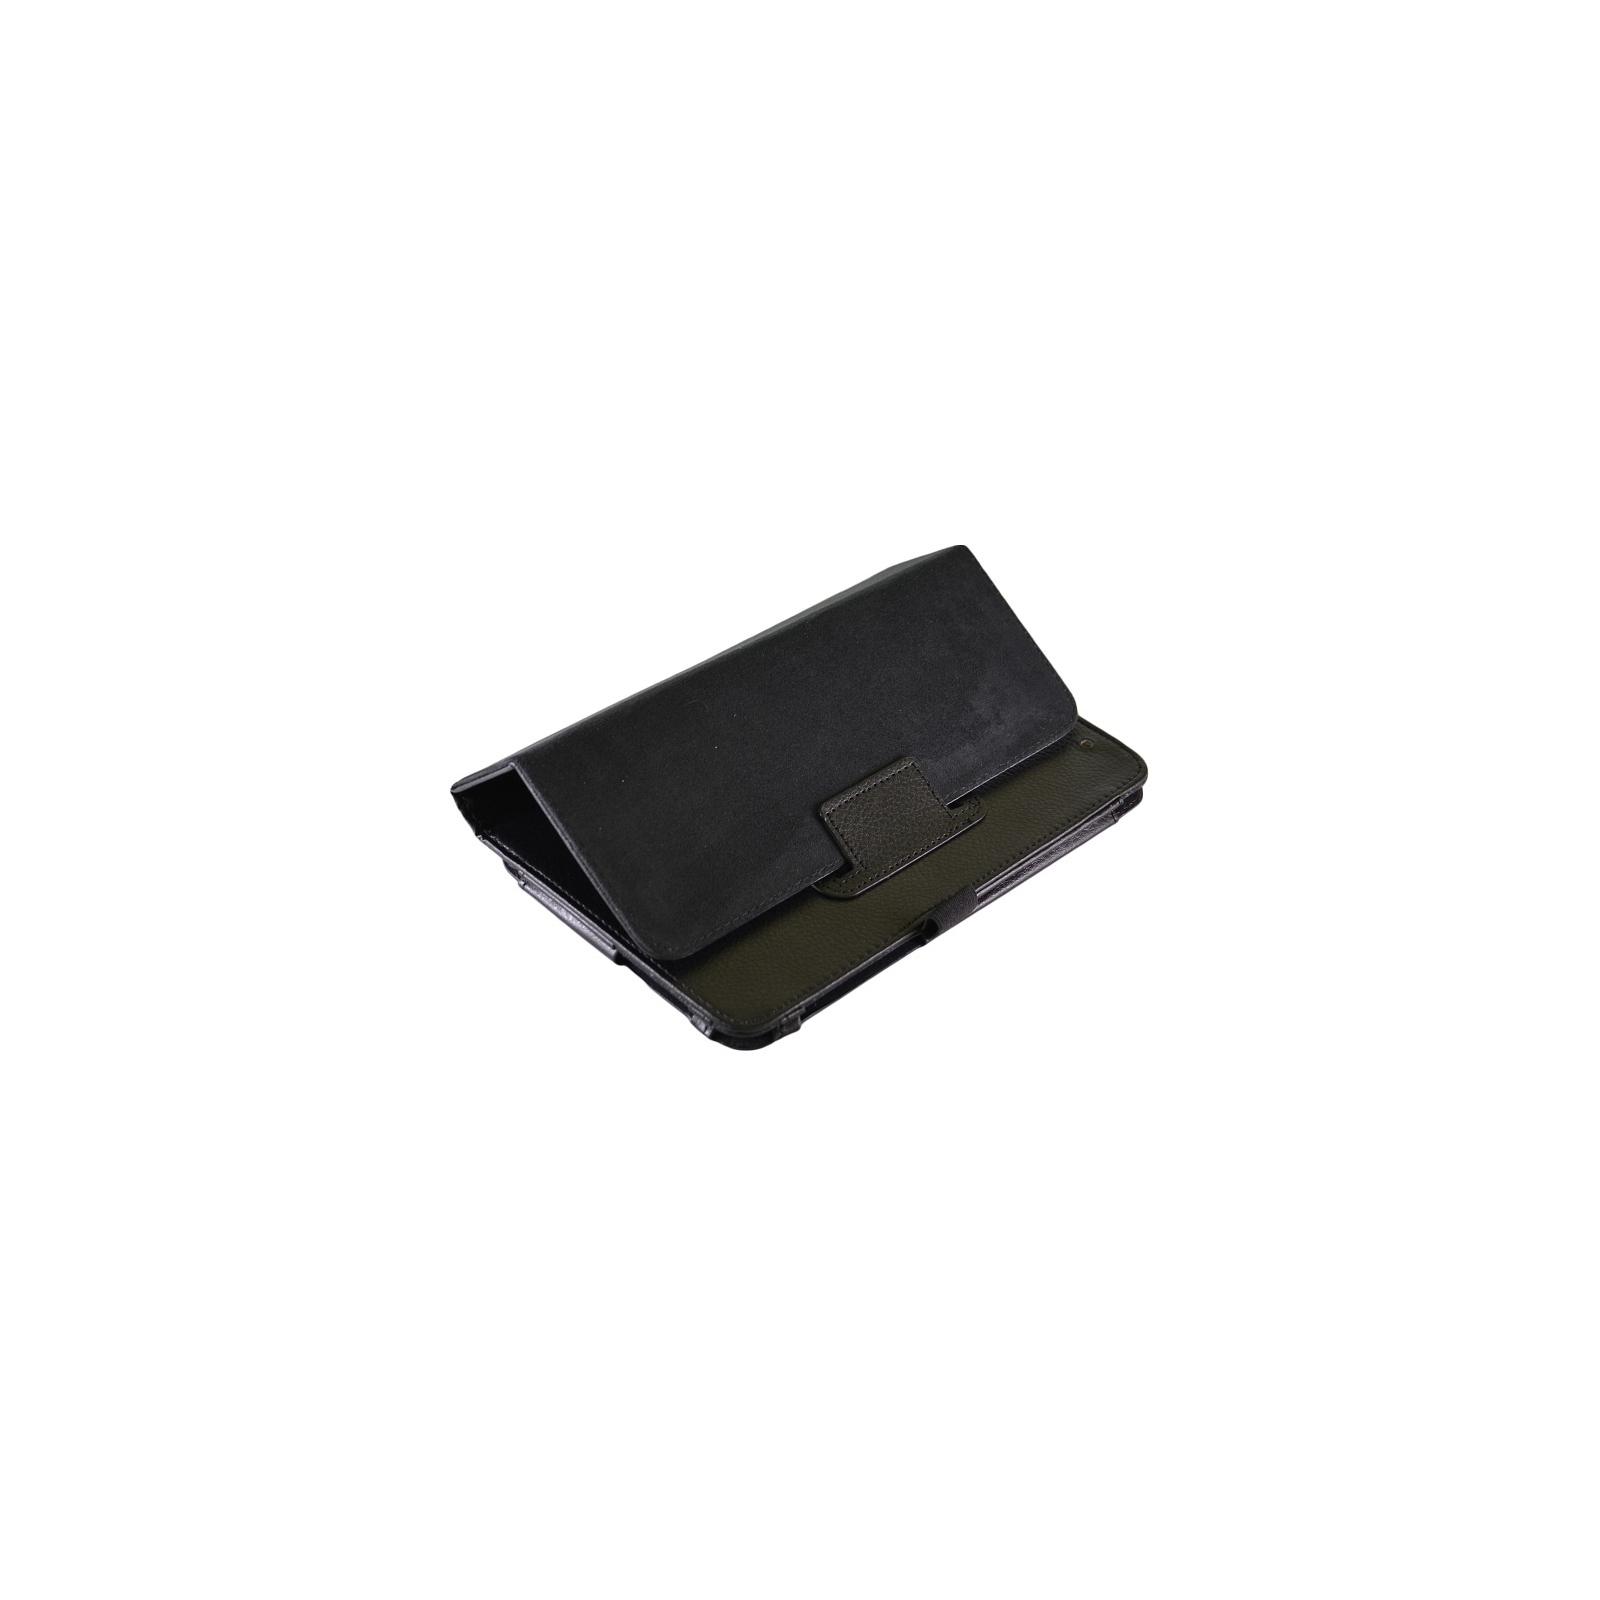 "Чехол для планшета Pro-case 7"" Pro-case Asus Memo Pad ME173 7"" (ME173 7"") изображение 3"